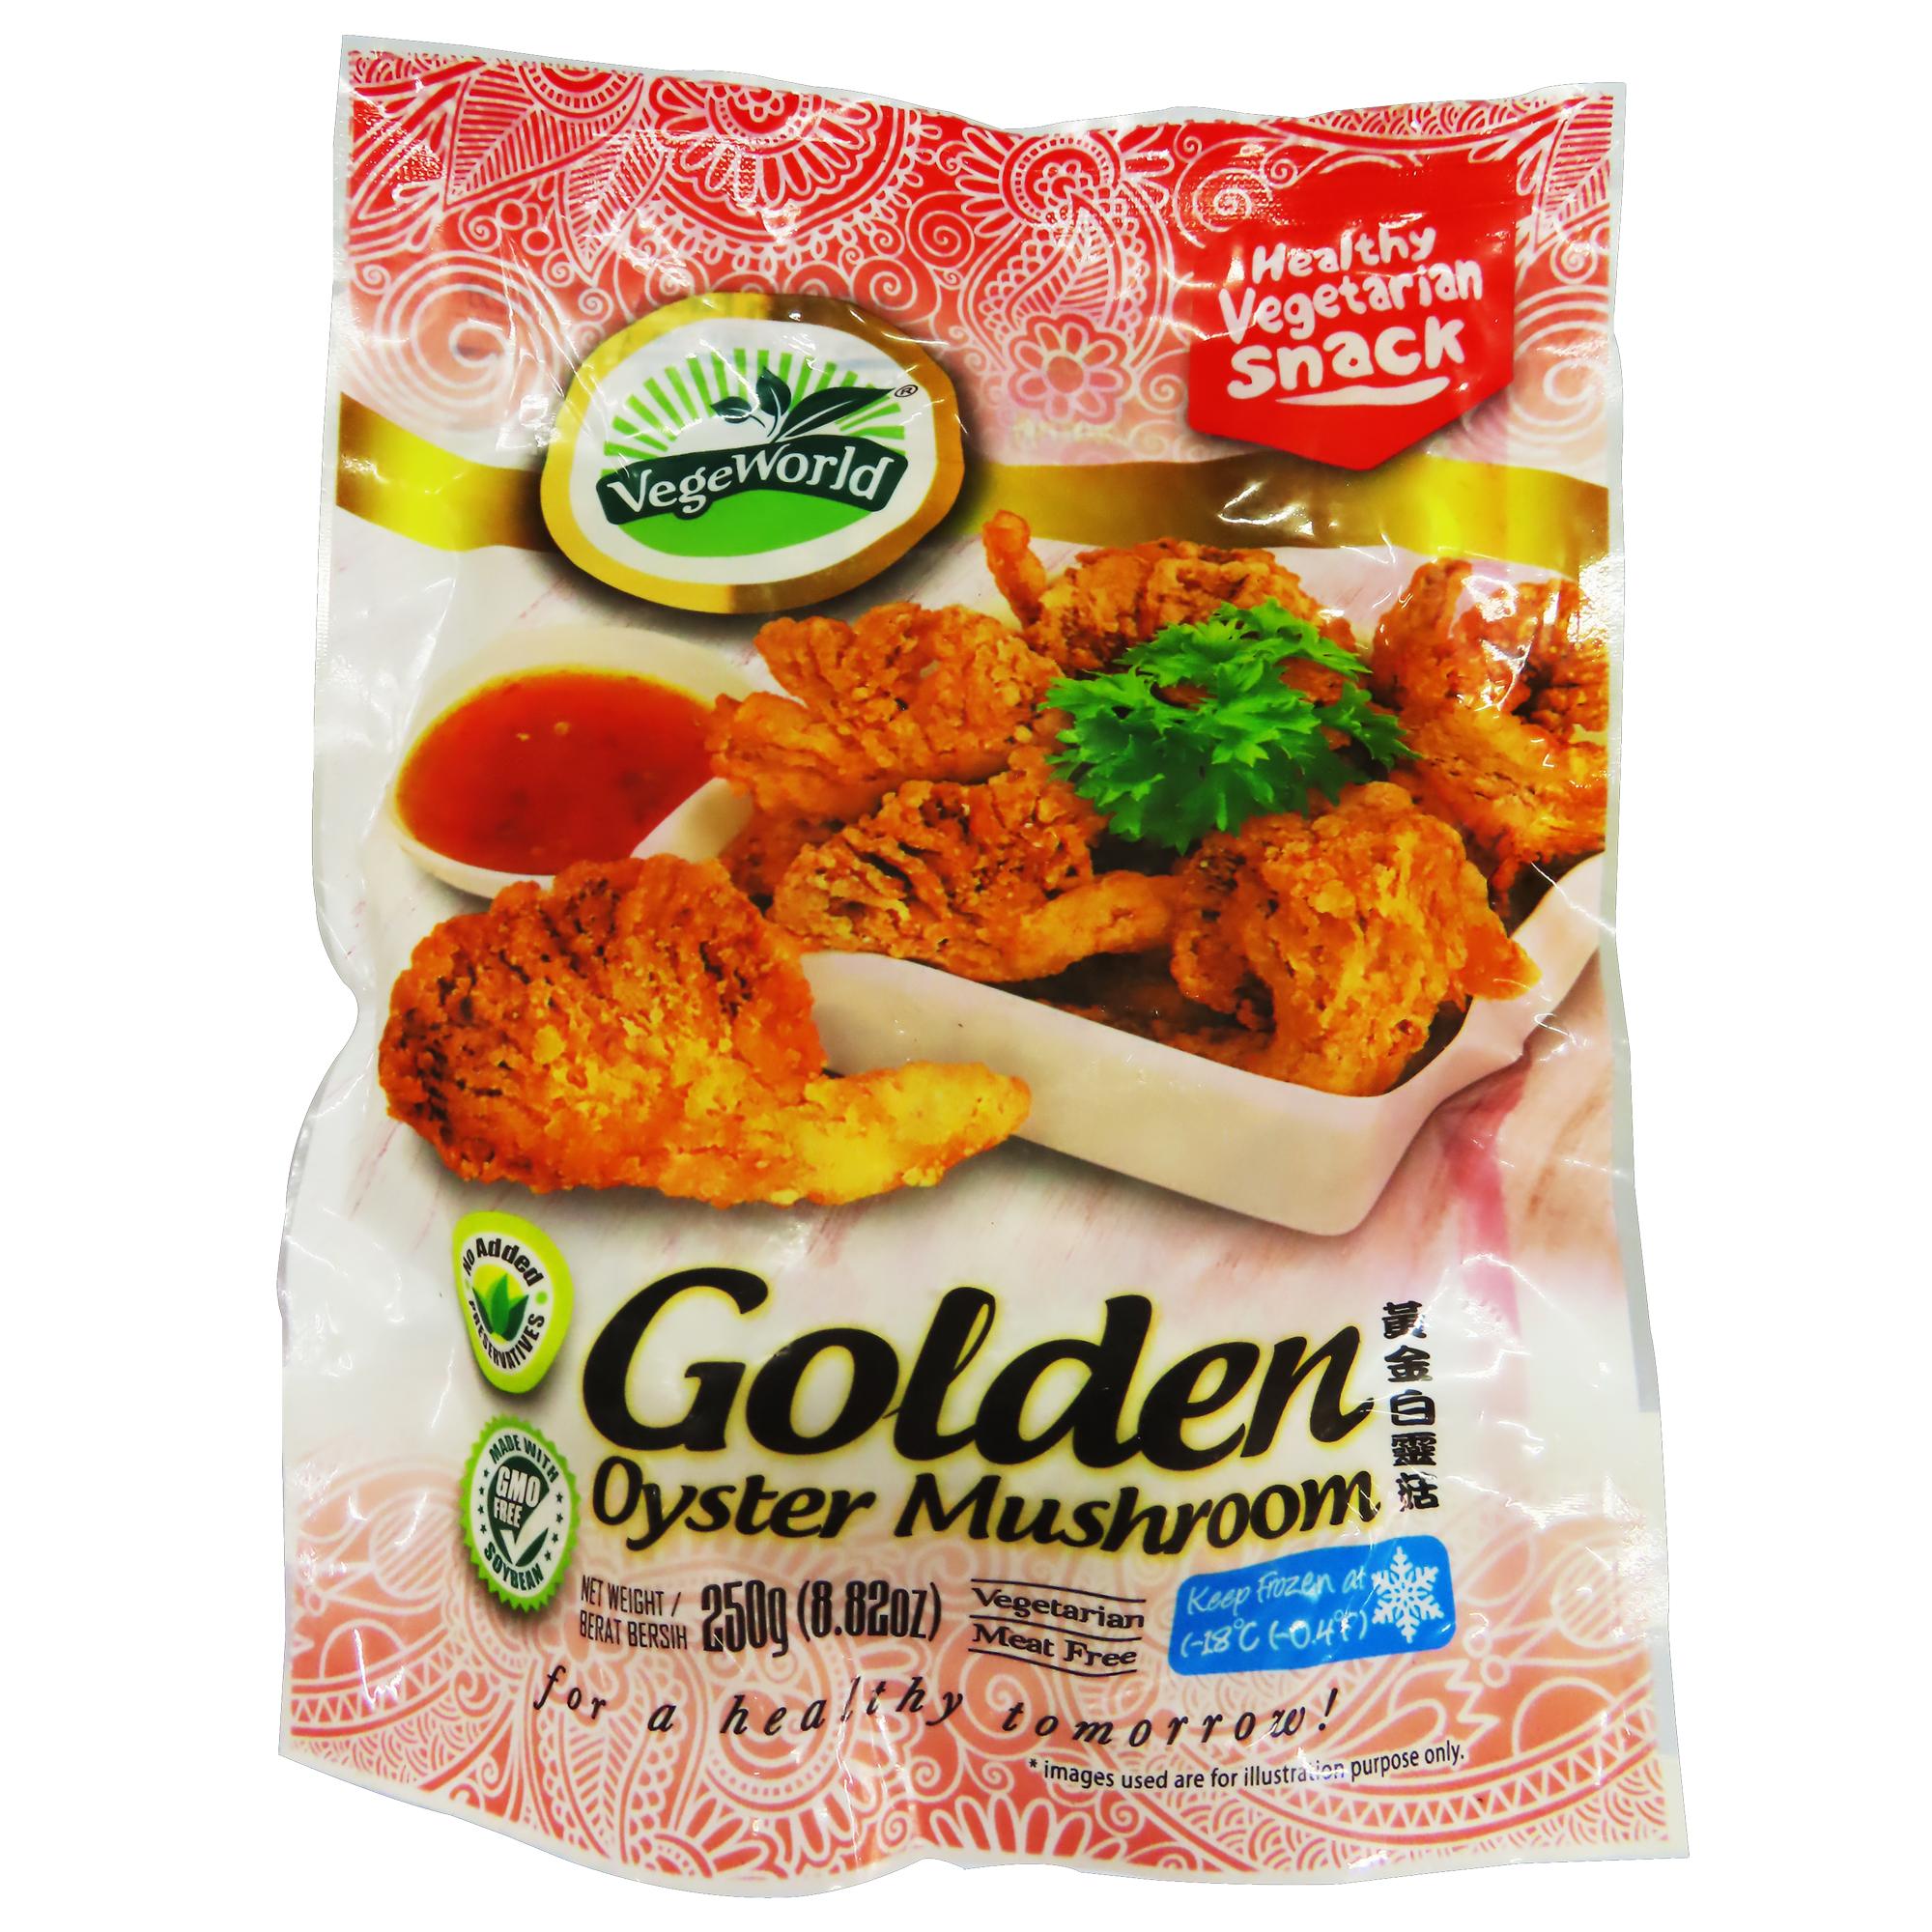 Image Golden Oyster Mushroom 三阳 - 黄金白灵菇 250grams